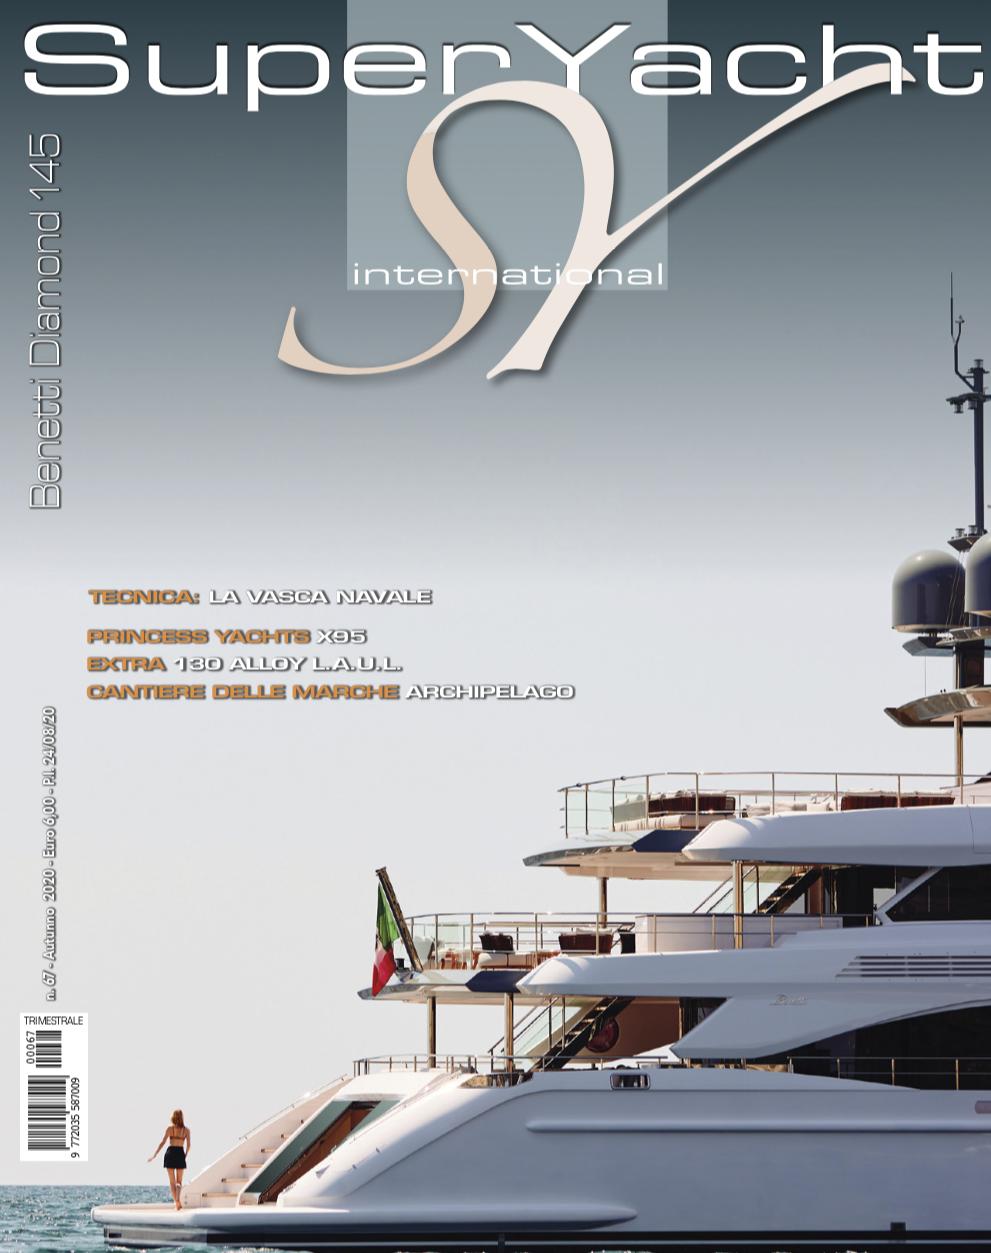 Copertina-Superyacht67-autunno-2020